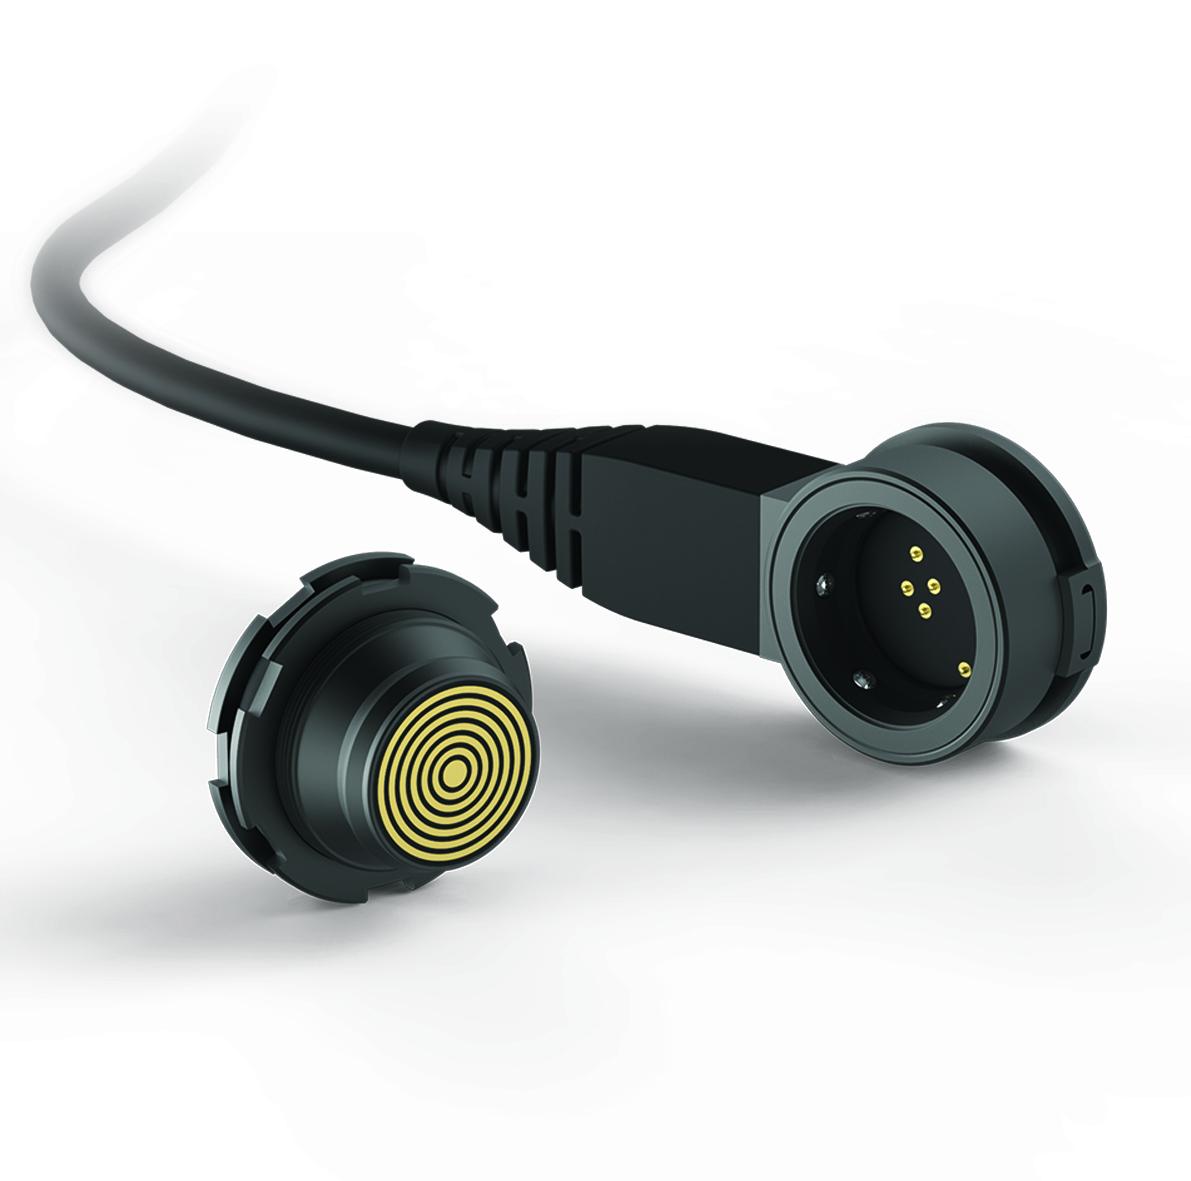 Fischer Connectors' breakthrough wearable technology: the LP360.